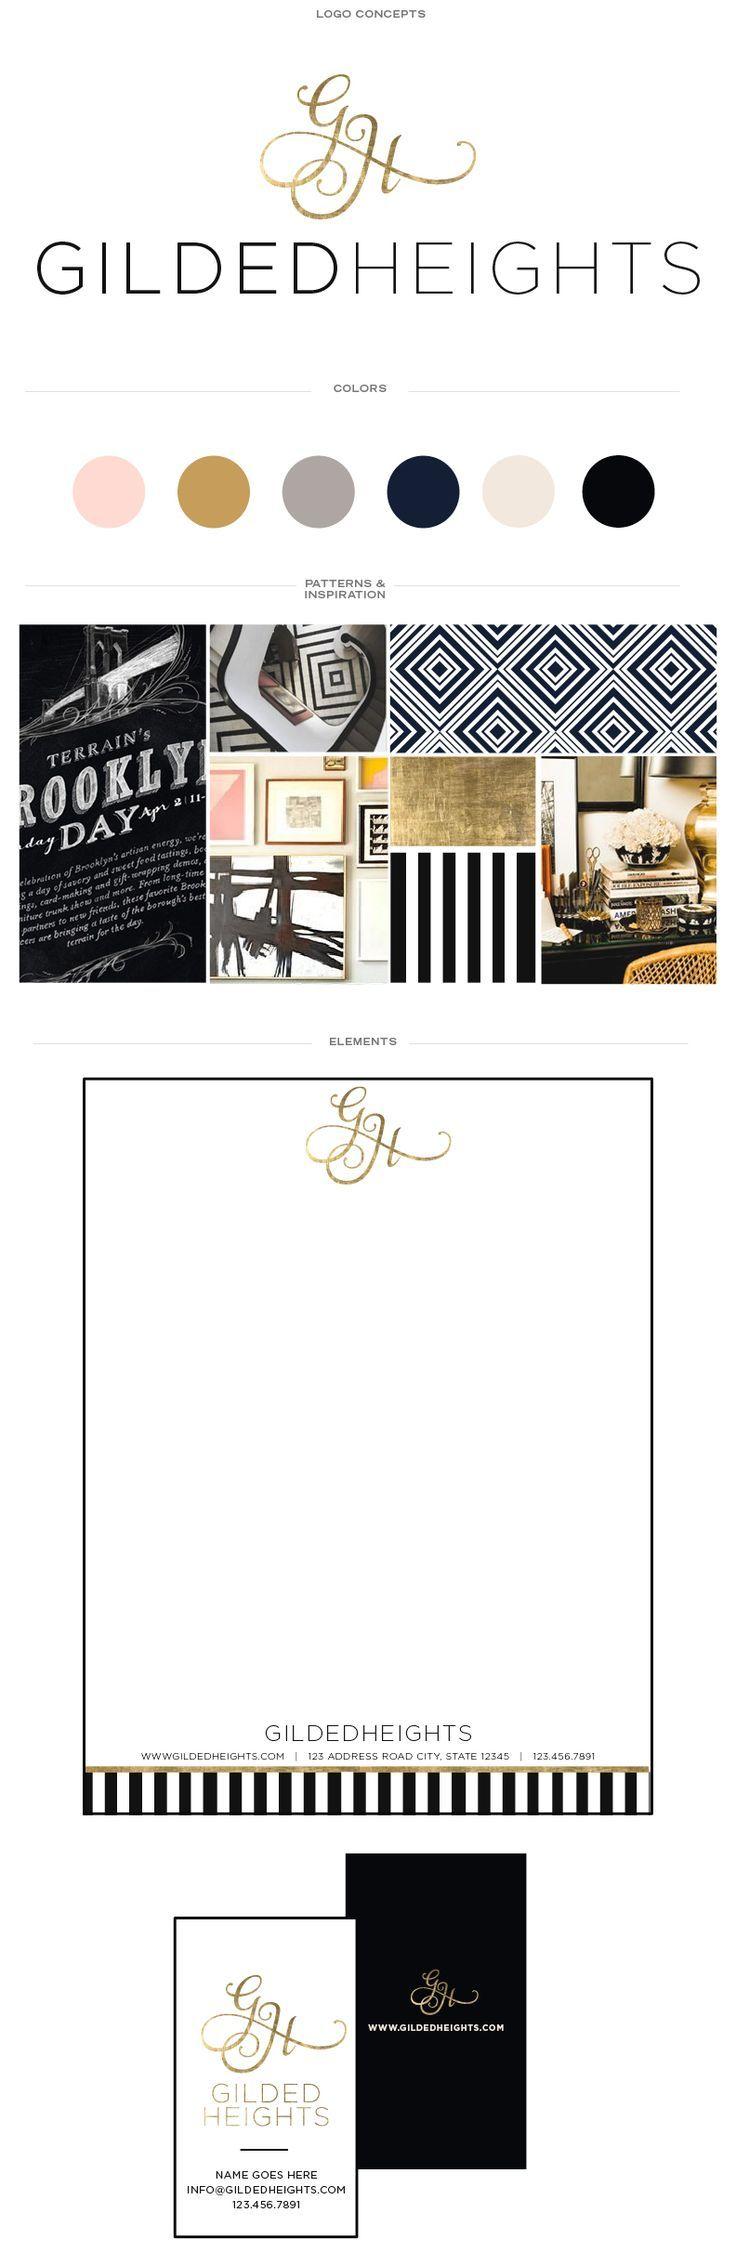 Interior Designer, Gilded Heights' New Brand and Website